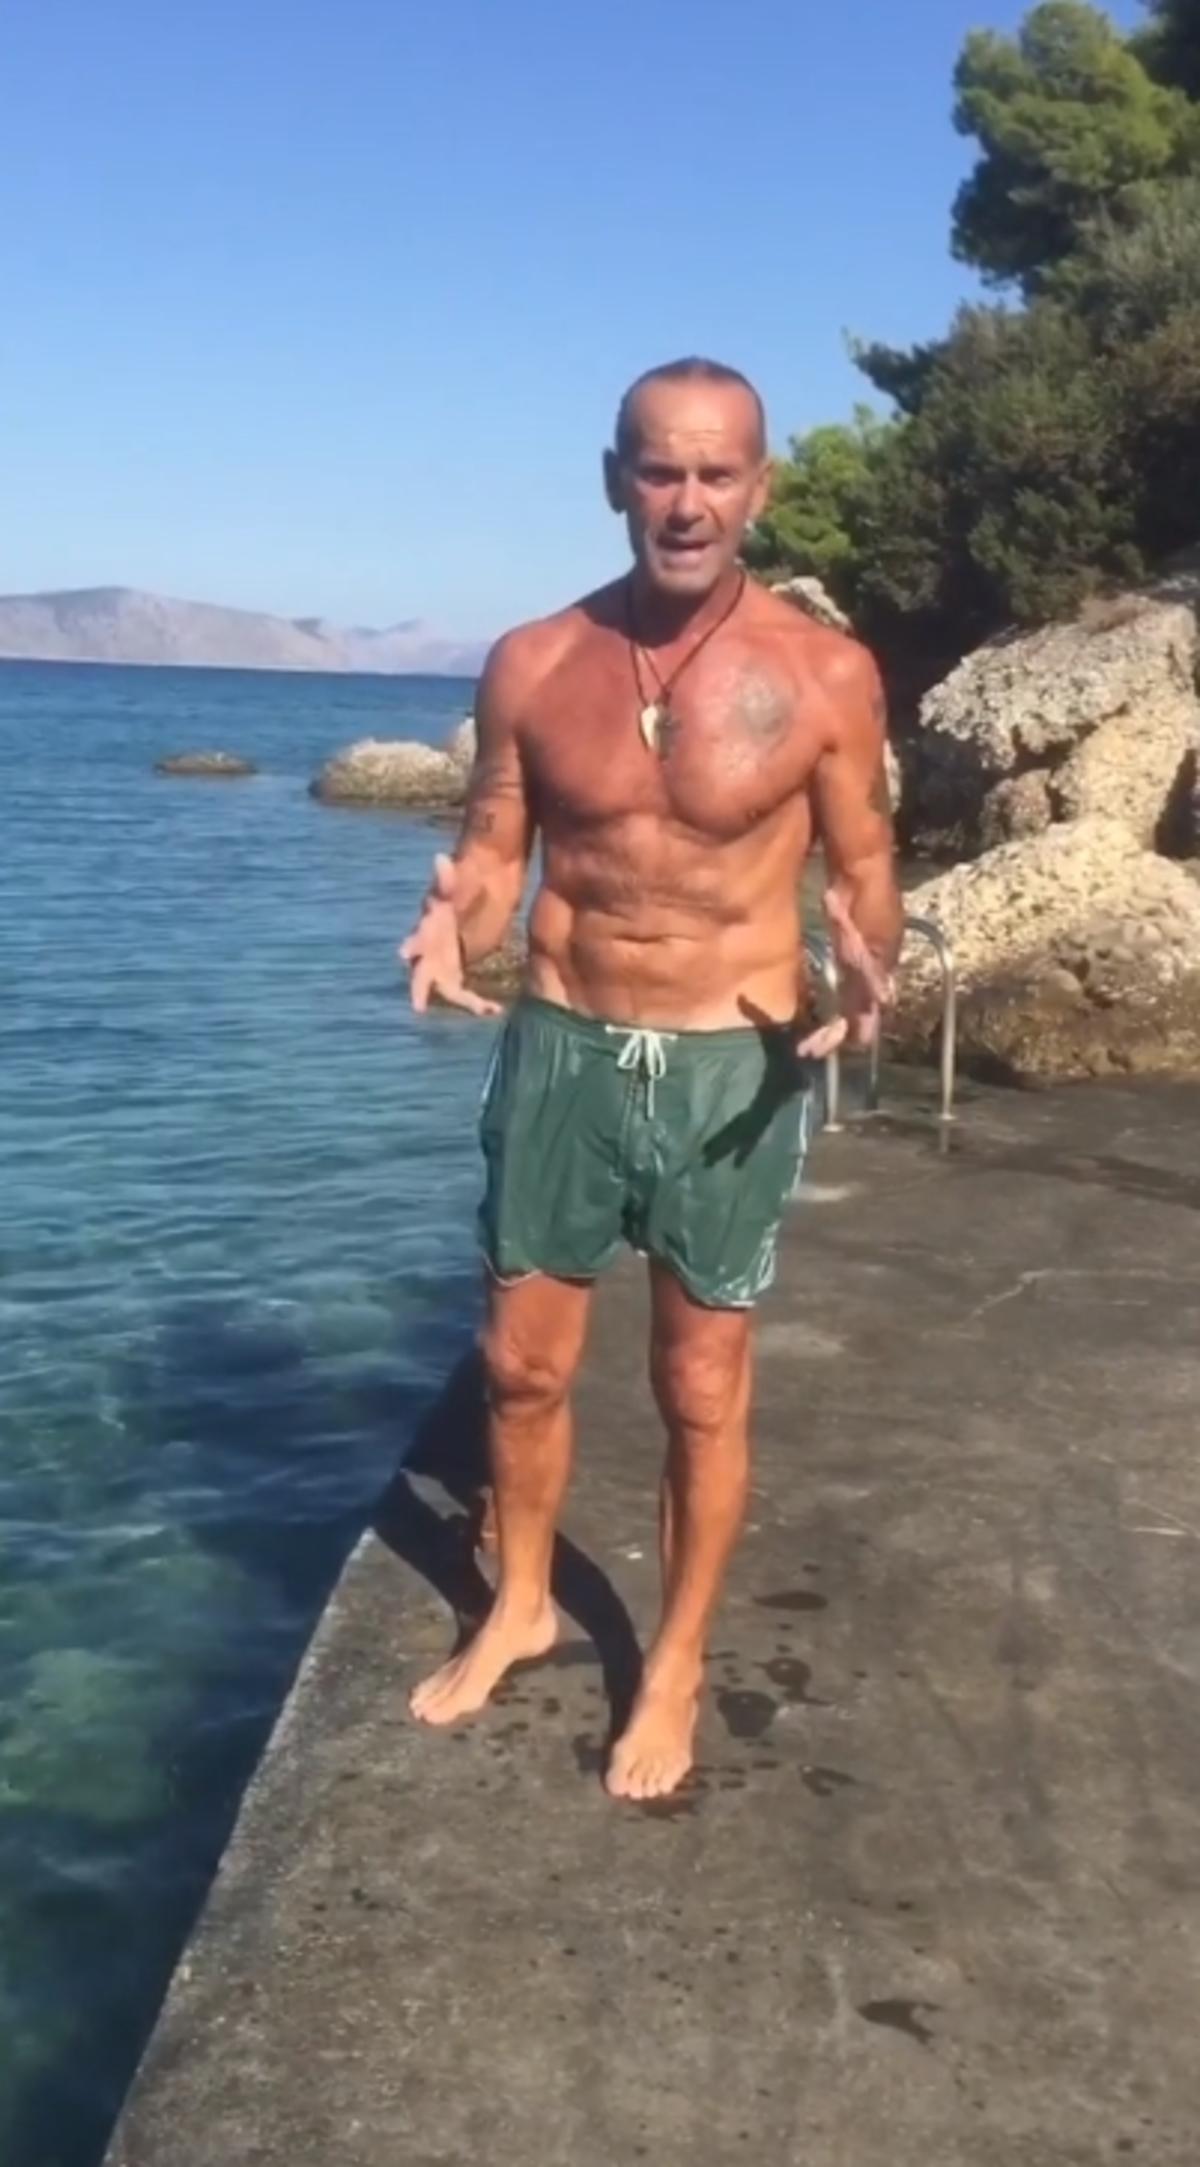 kwstopoulos1 - Έξαλλος ο Πέτρος Κωστόπουλος: «Ποια πουτ…» - παραλία, κωστόπουλος, αχινός